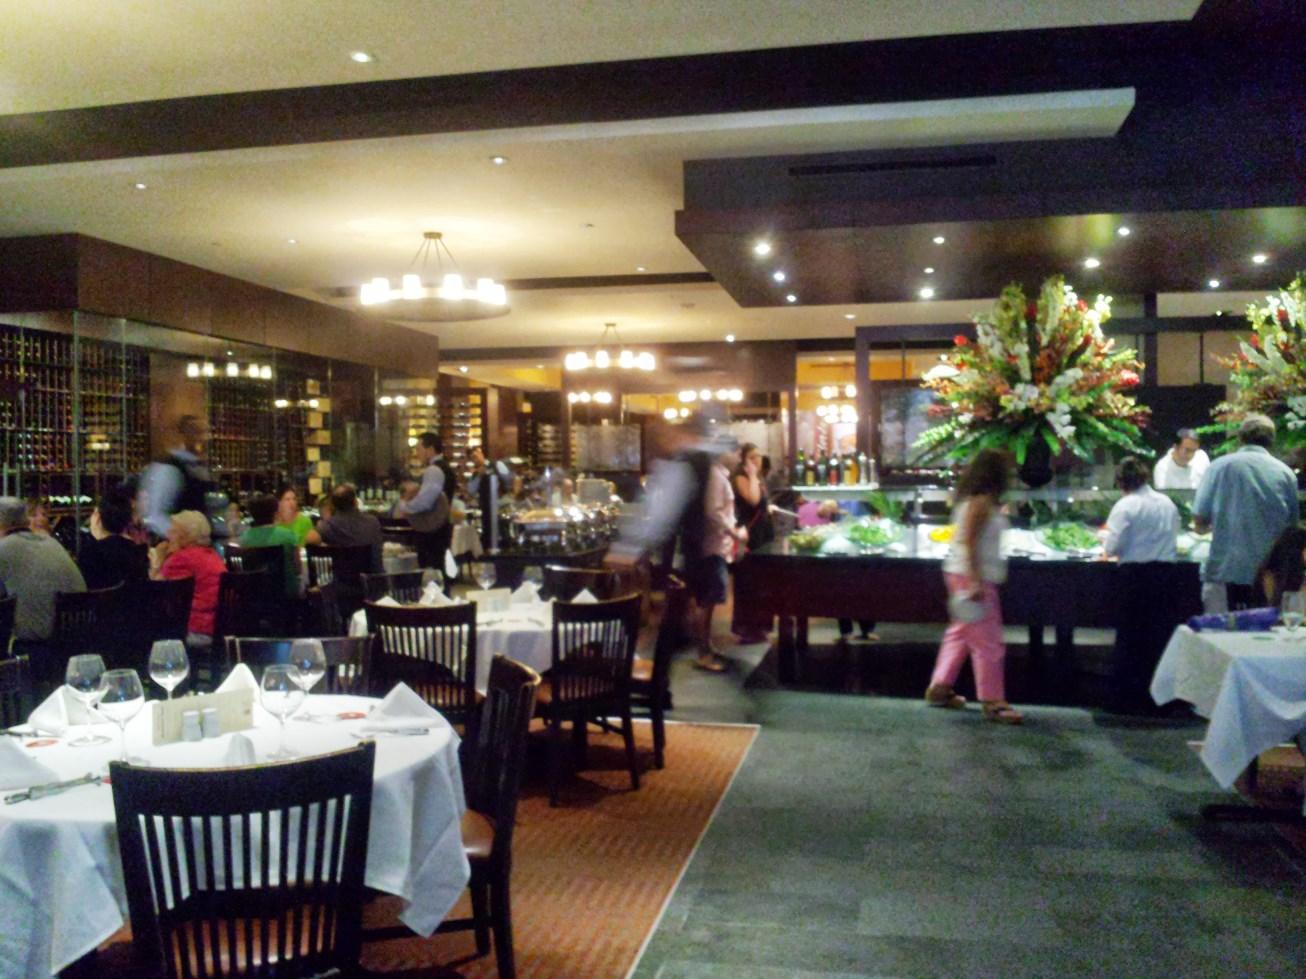 Picture inside Fogo de Chao restaurant